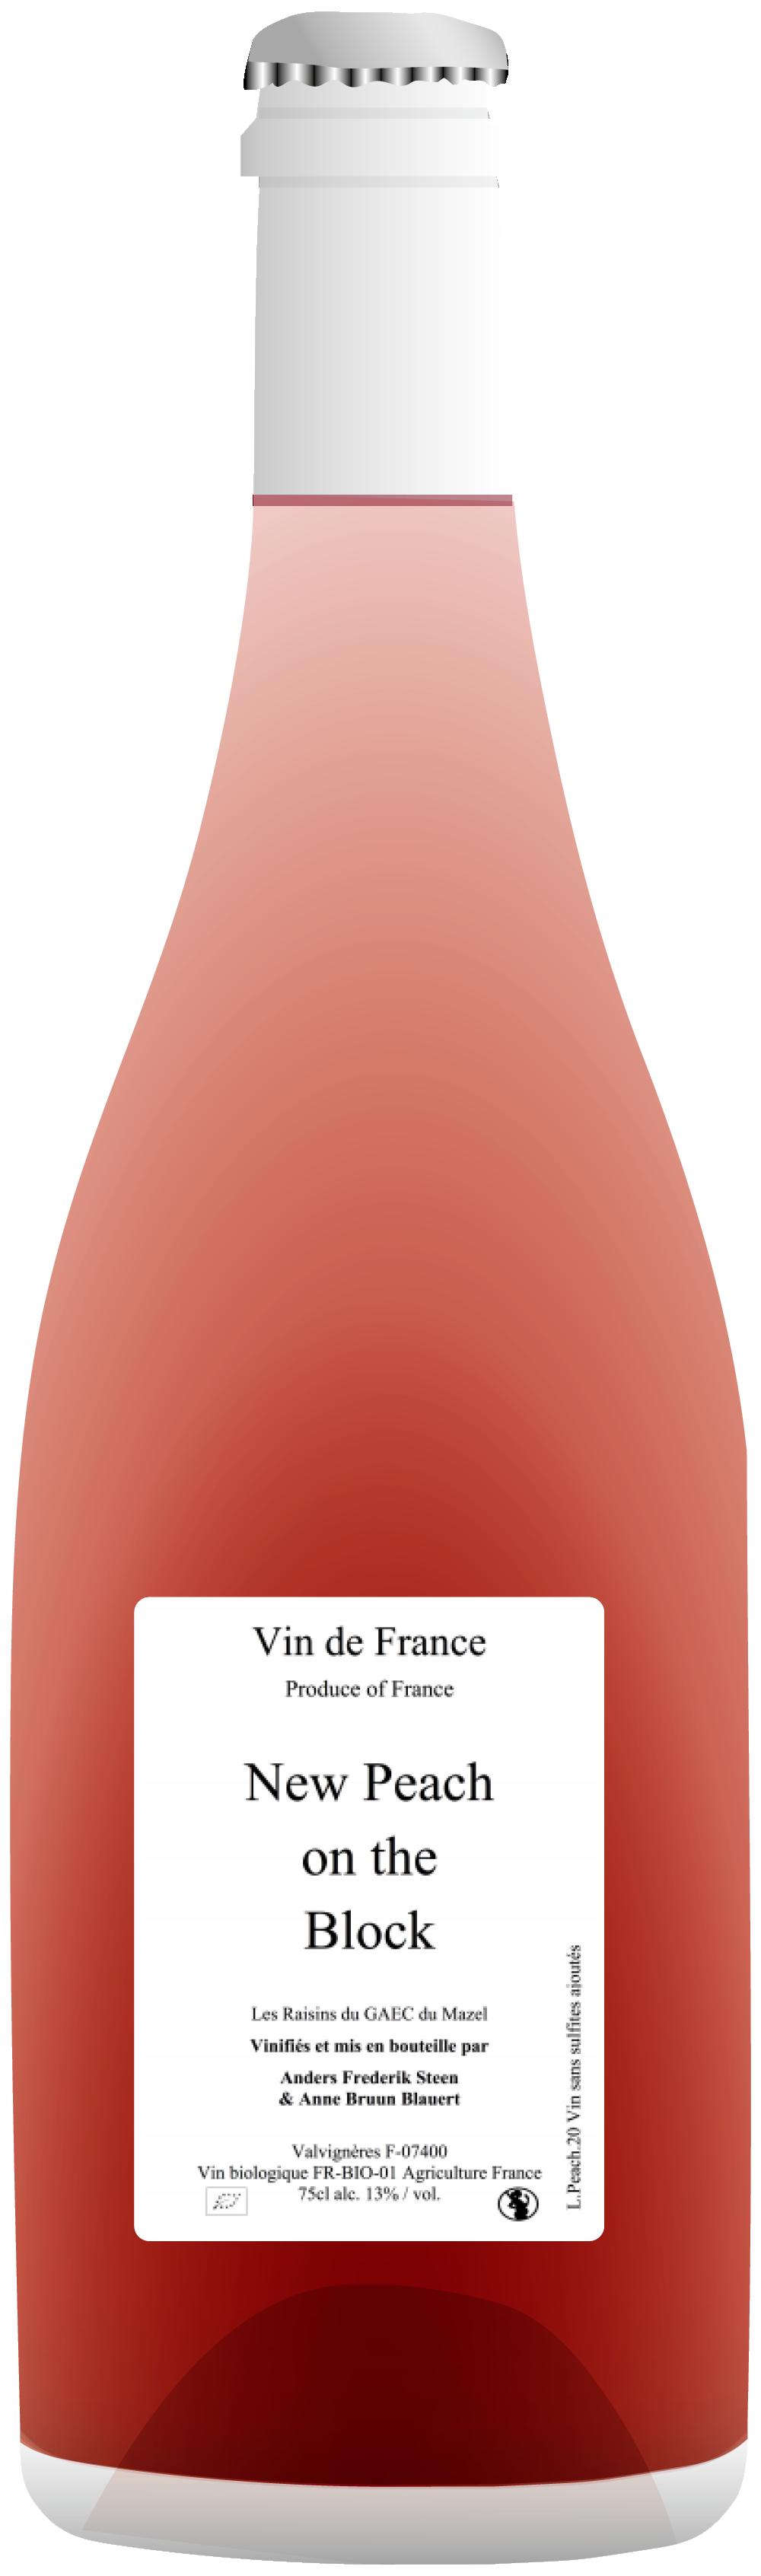 the natural wine company club july 2021 france anders frederik steen anne bruun blauert new peach on the block